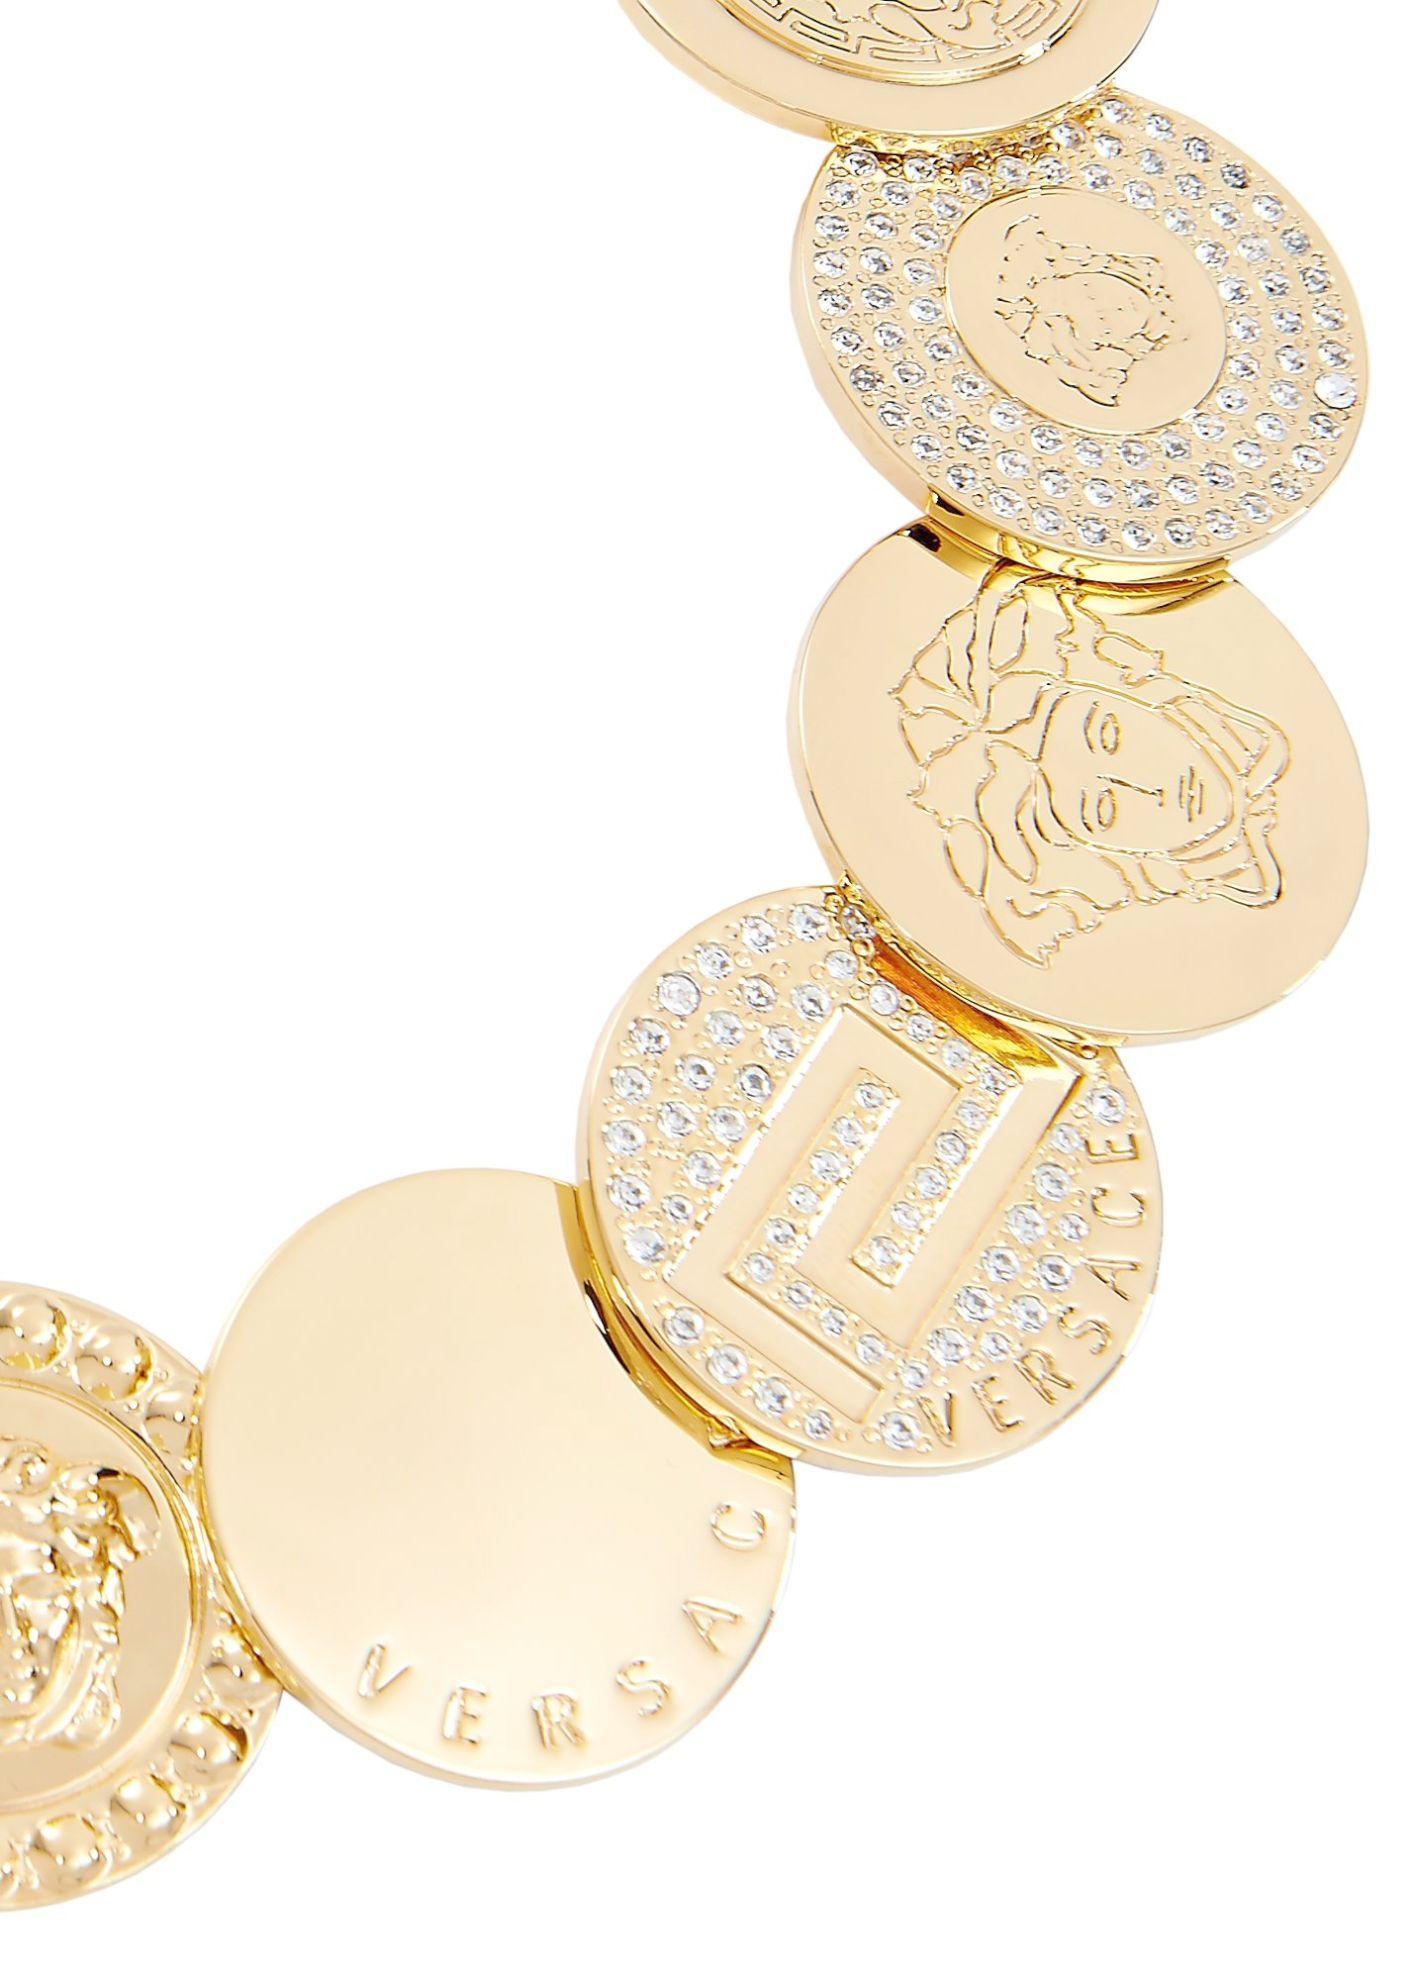 Gold jewellery loan gold jewellery design gold jewellery n art